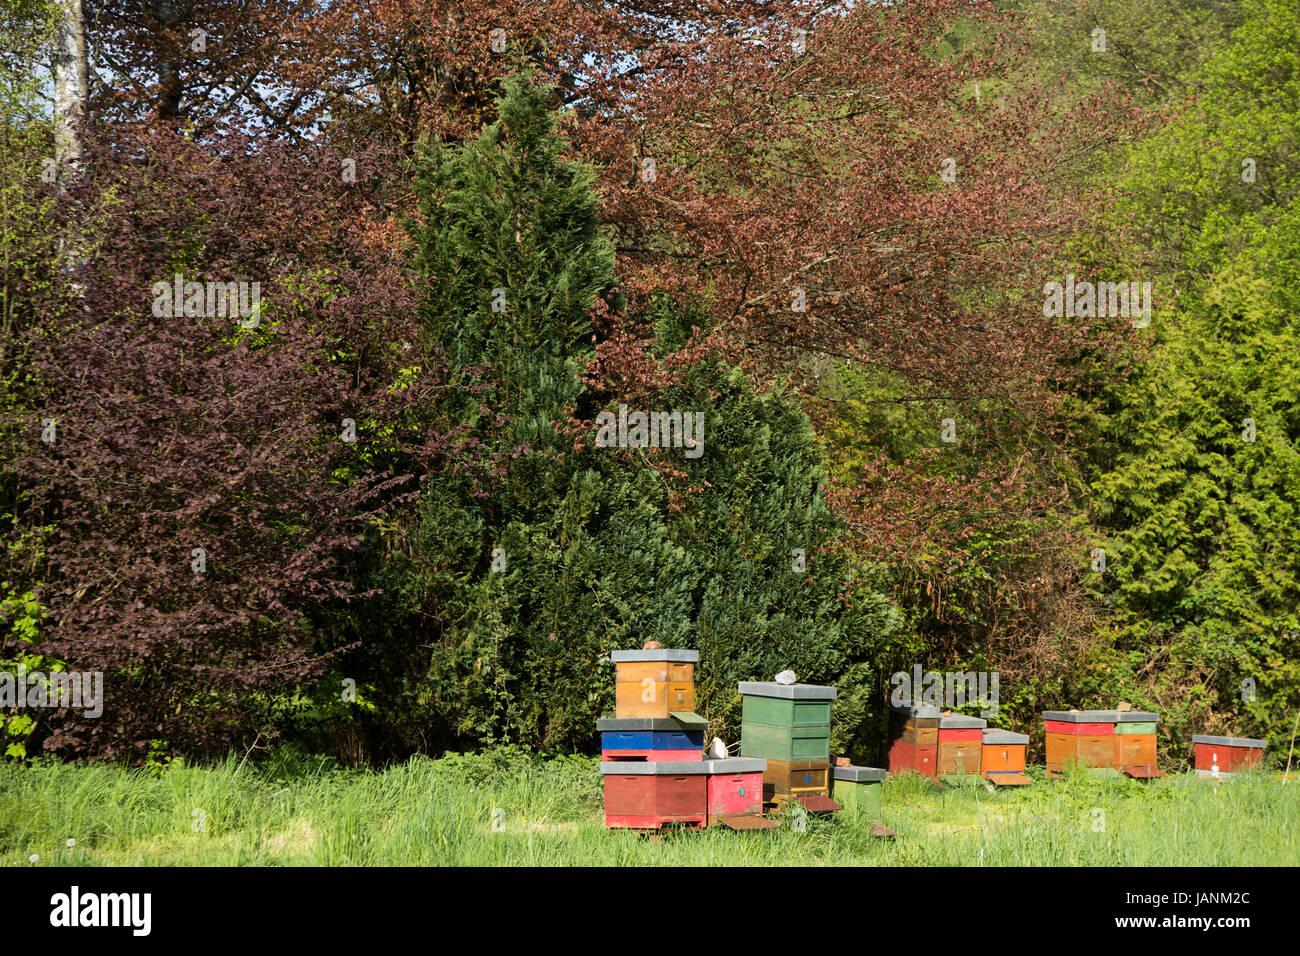 BRD, Nordrhein-Westfalen, Oberbergischer Kreis, Nümbrecht-Benroth, Bienenkästen - Stock Image